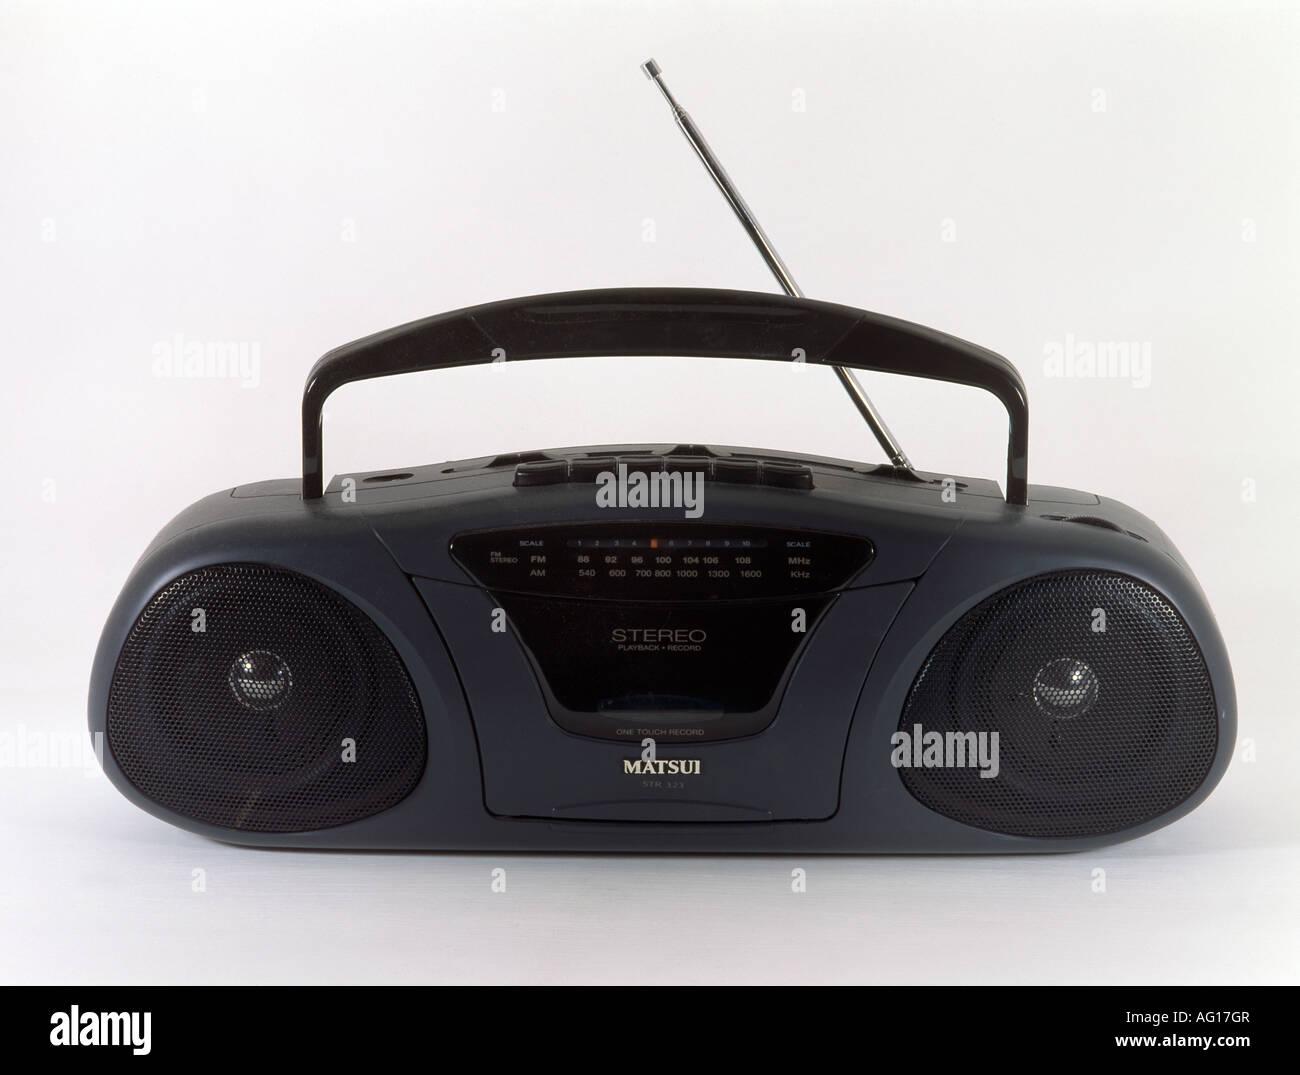 Matsui Radio - Stock Image